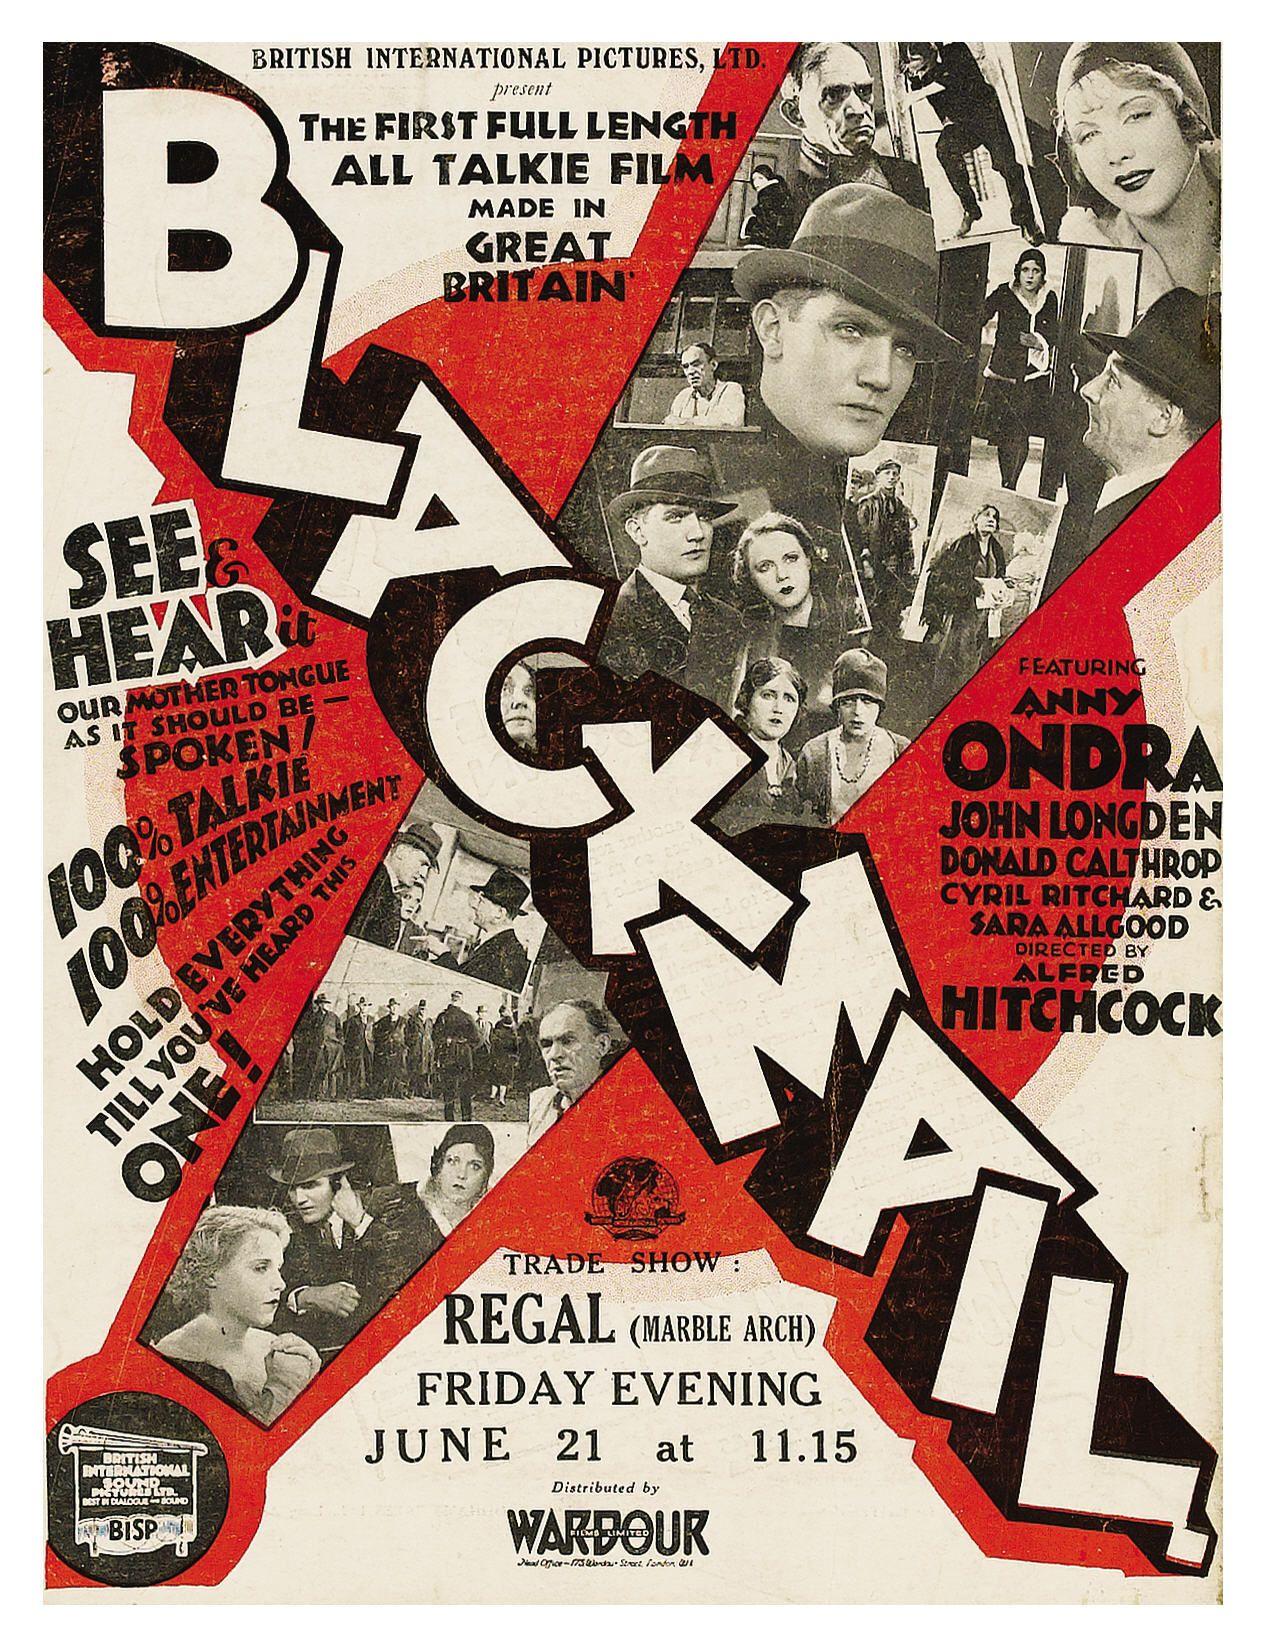 Blackmail (1929, dir. Alfred Hitchcock) UK Kine Weekly trade magazine ad